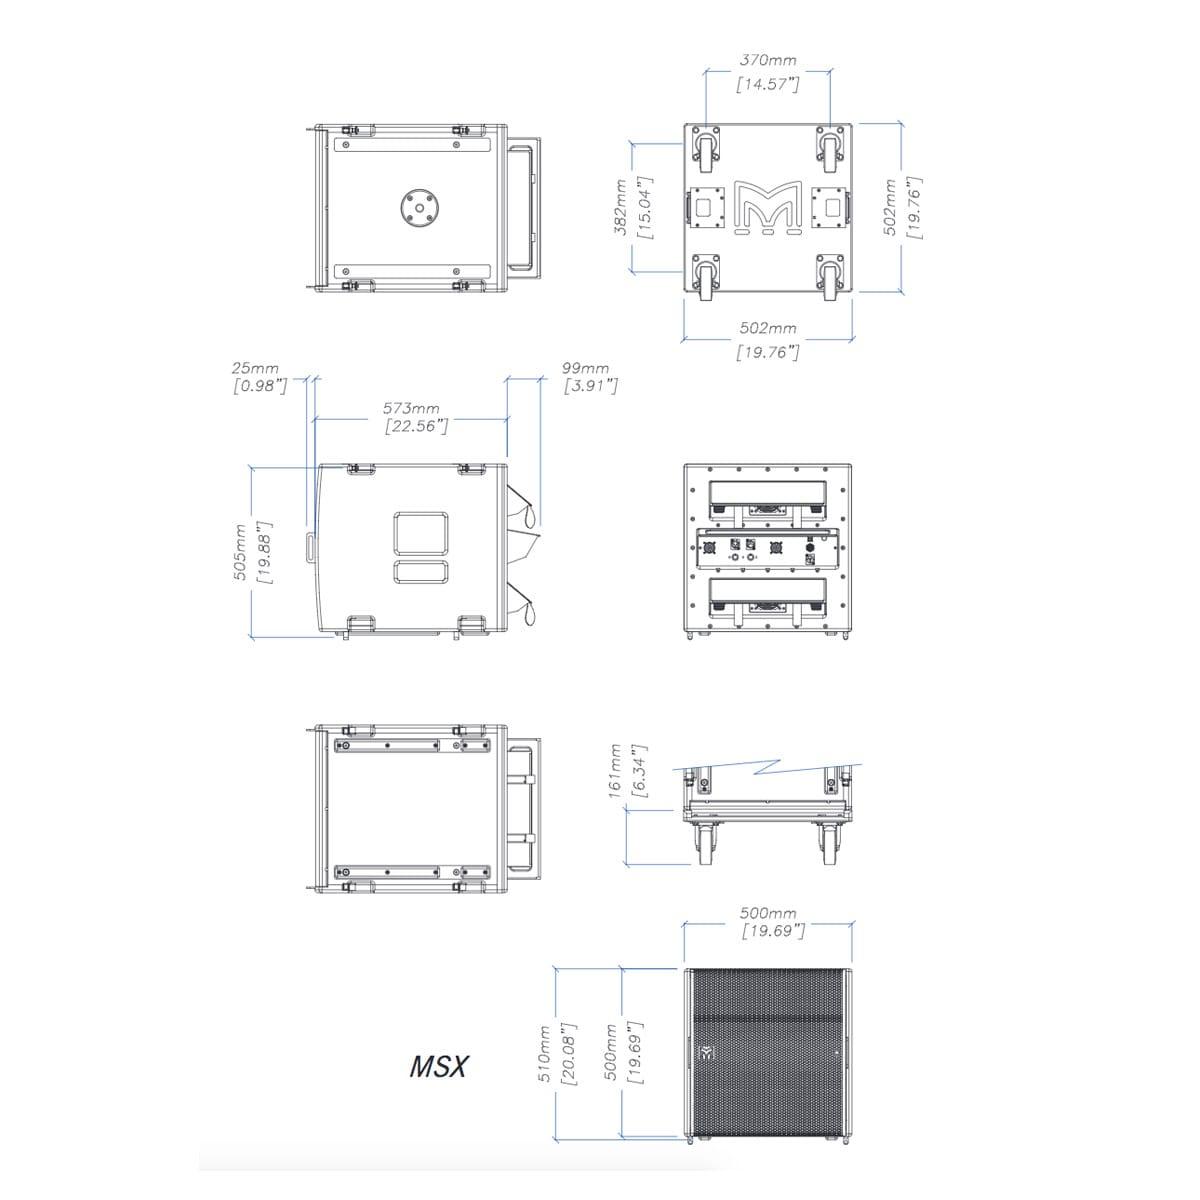 Martin Audio MSX Tech Drawing